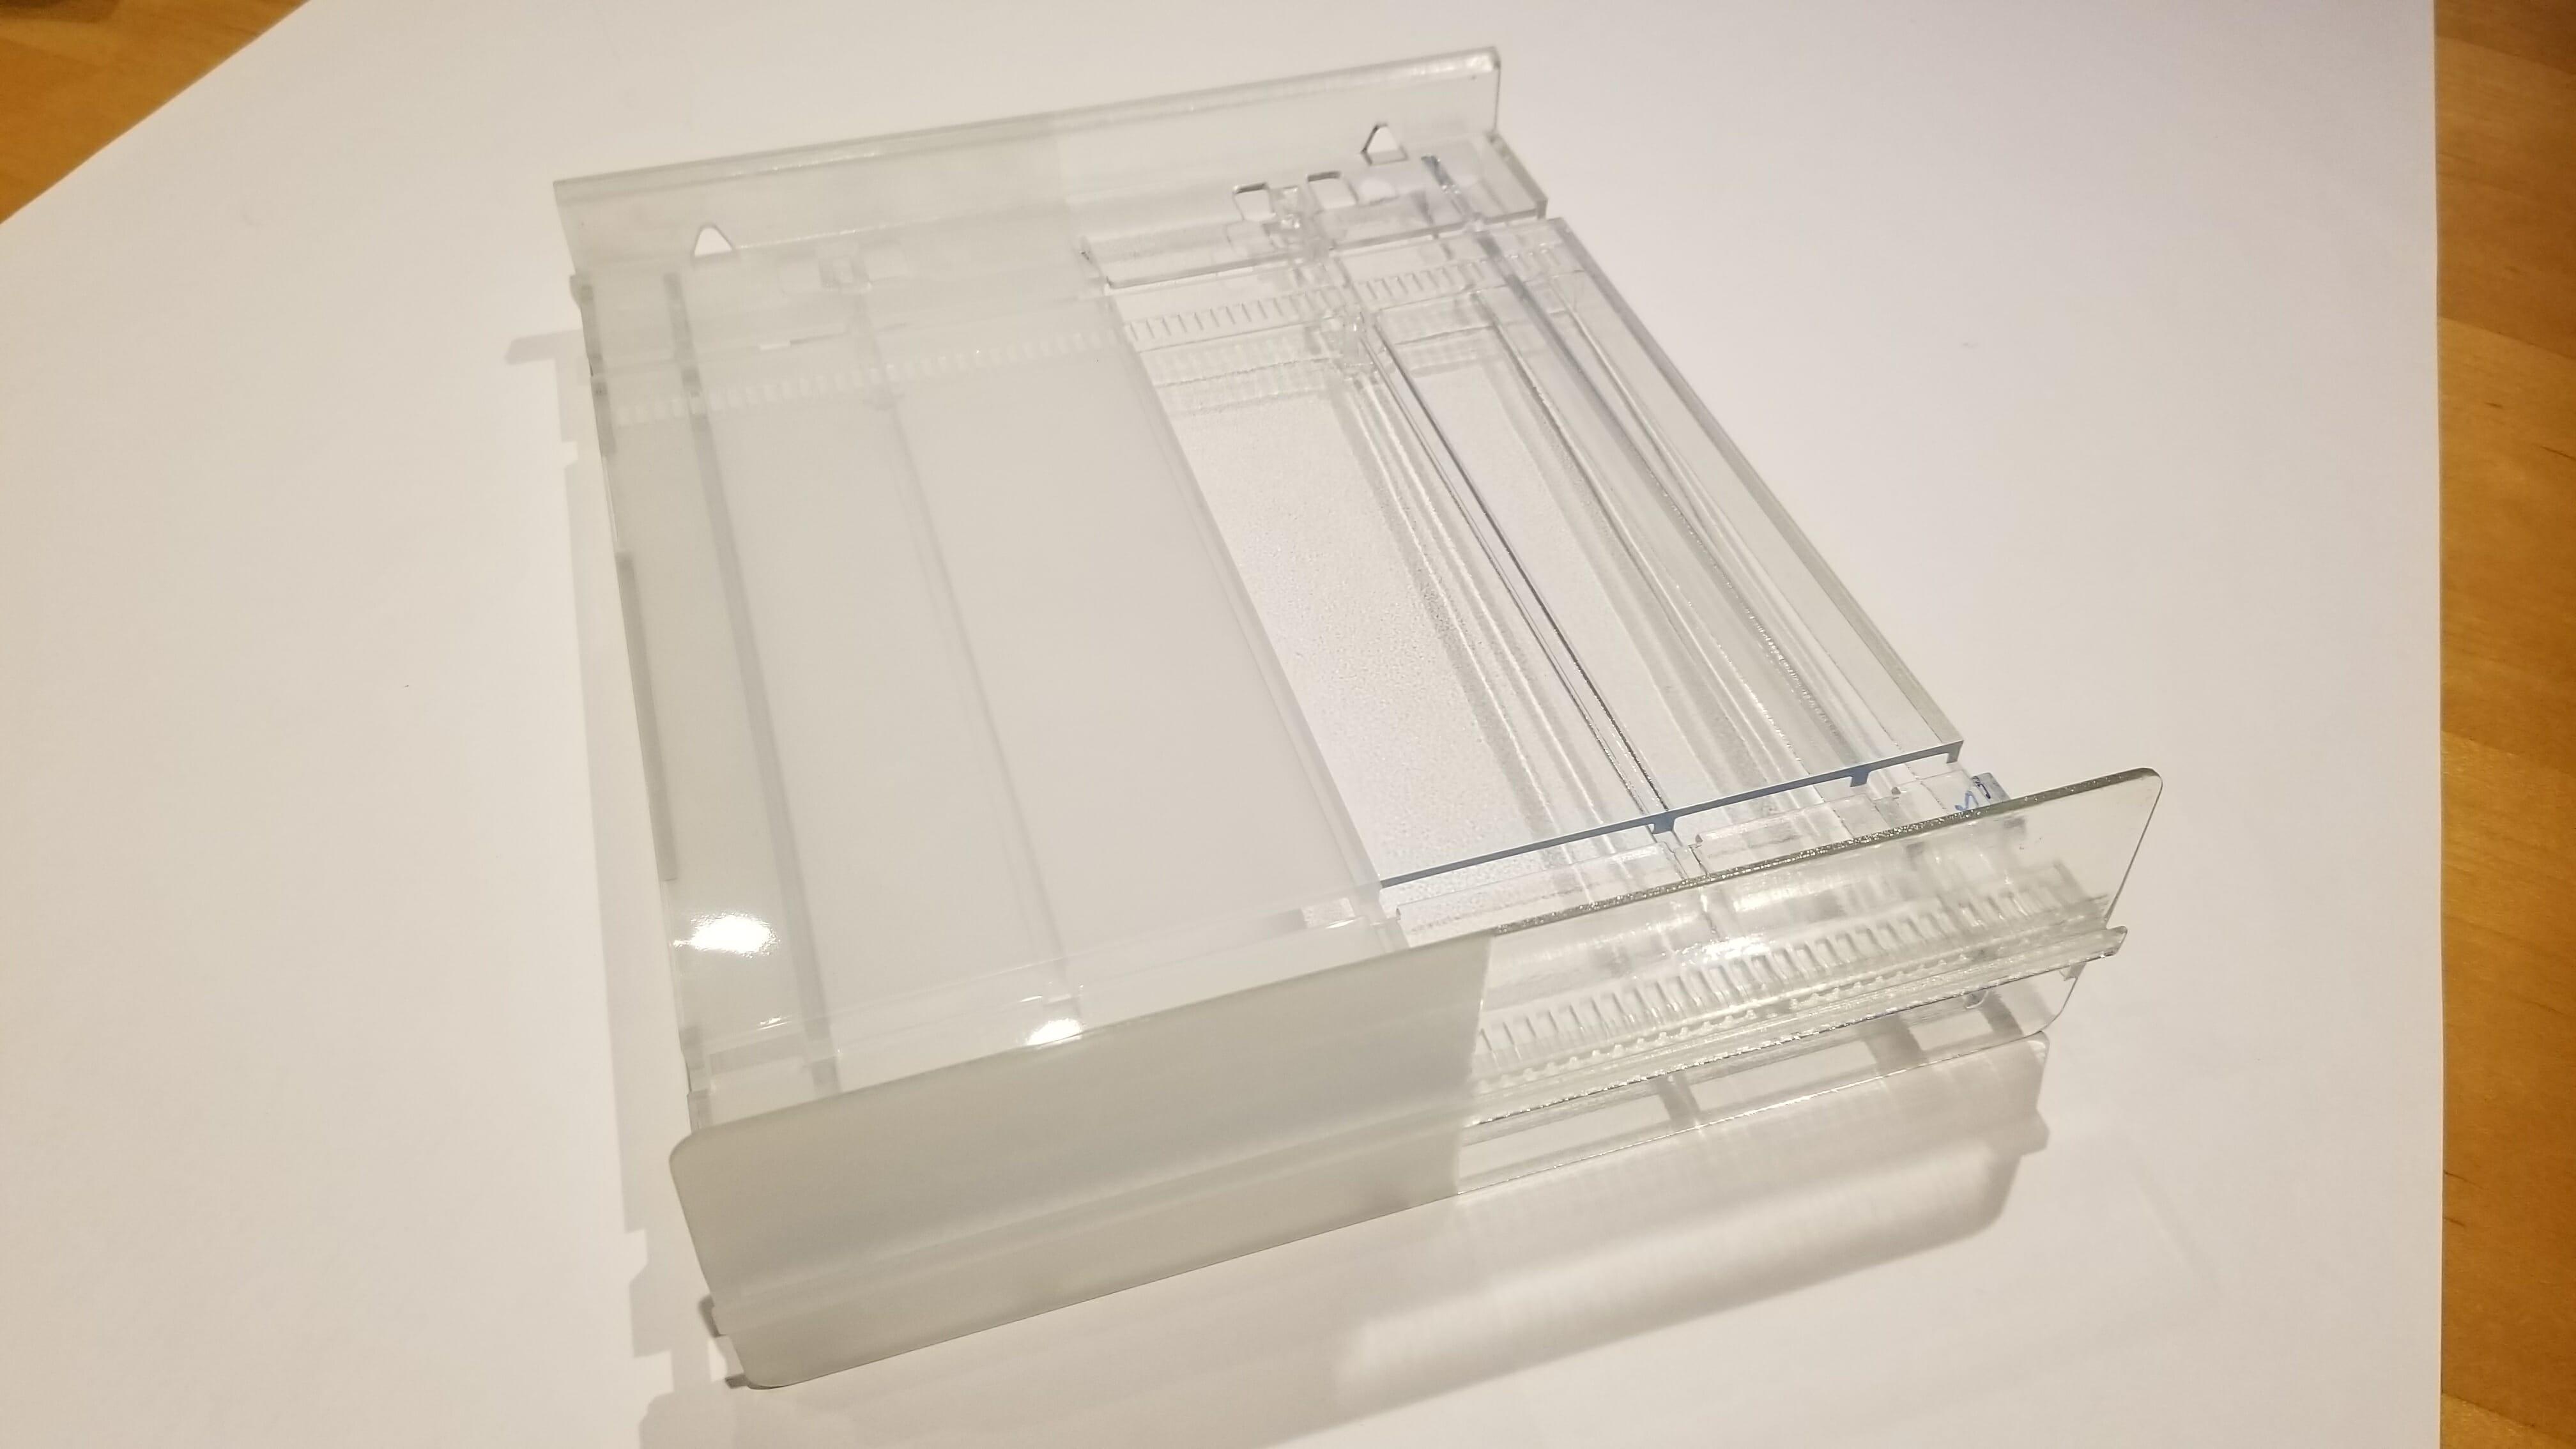 3D Printed Clear Parts - SLA and Polyjet printed lenses, windows